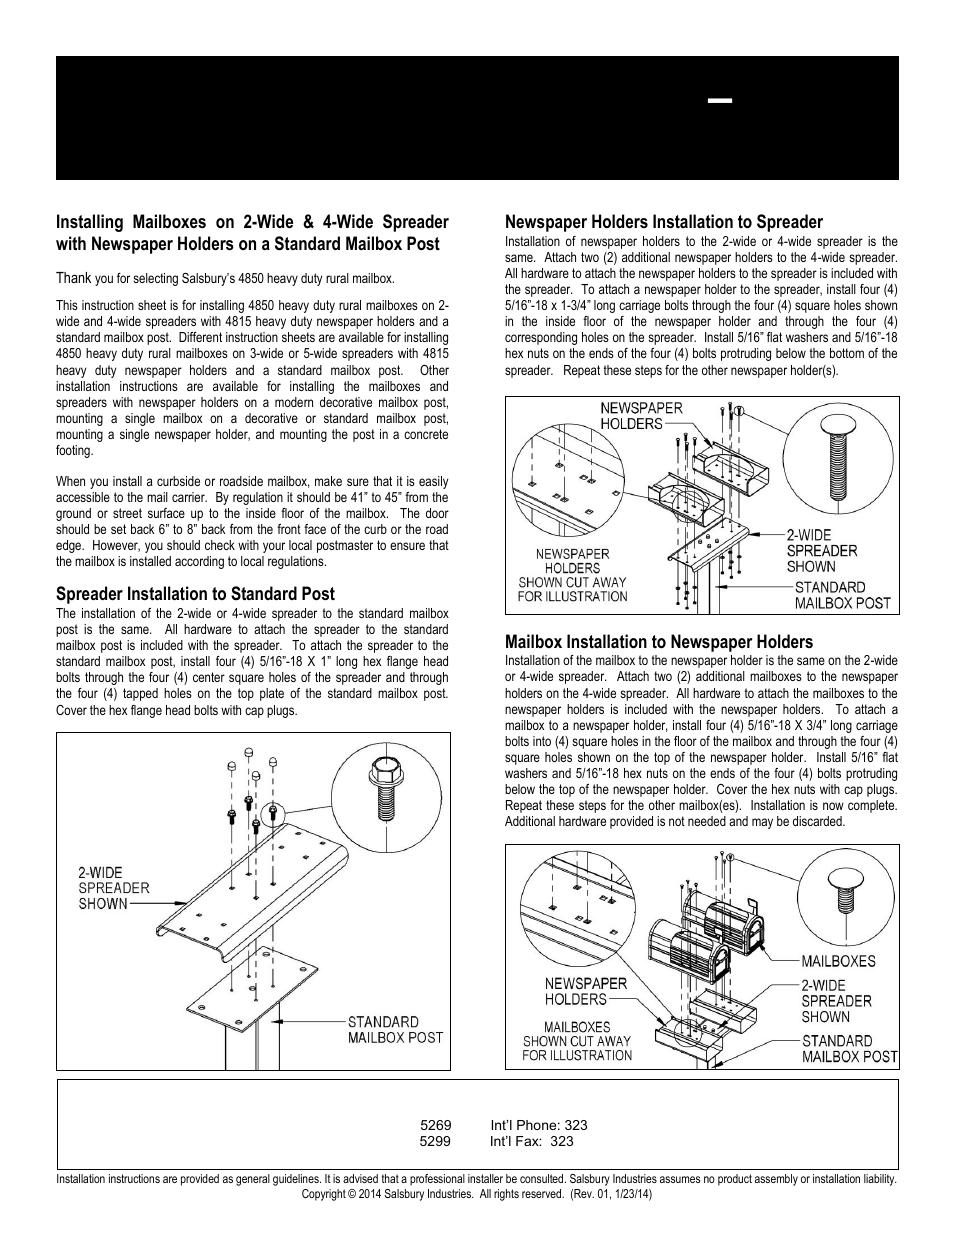 Heavy duty rural mailboxes – 4850 | Salsbury Industries 4850